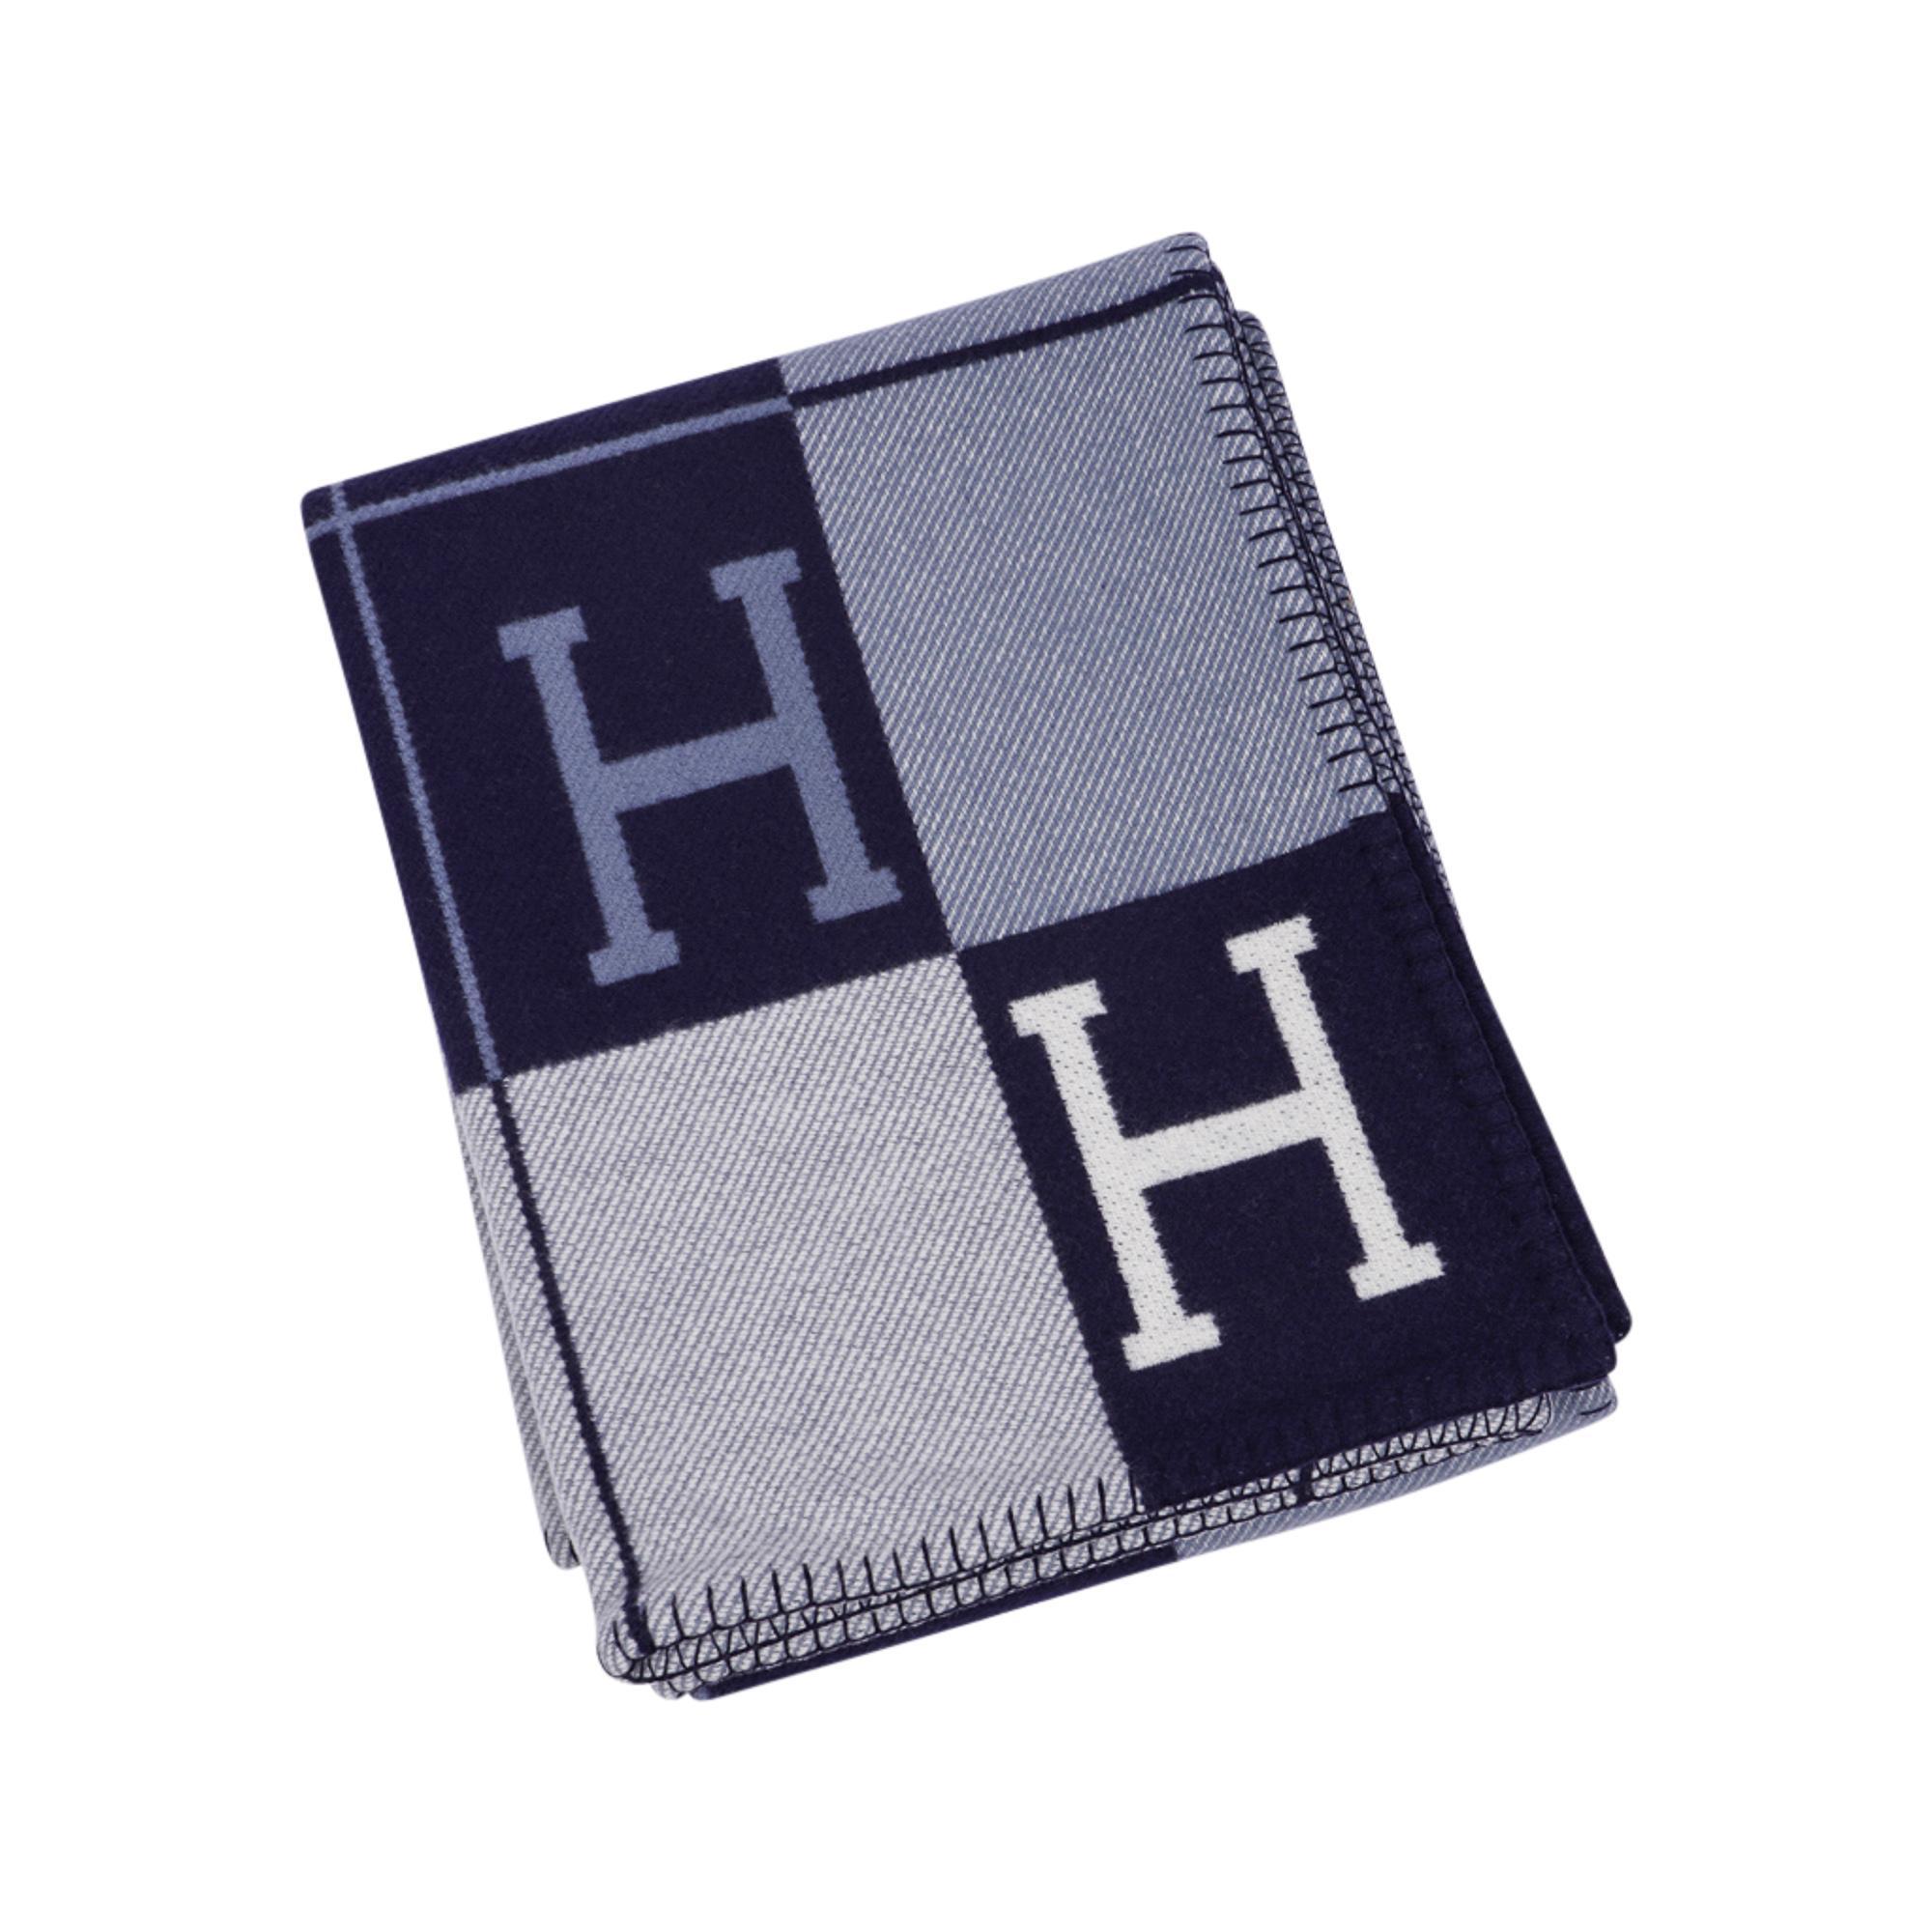 Hermes Blanket Avalon I Signature H Blue Throw New w/Box